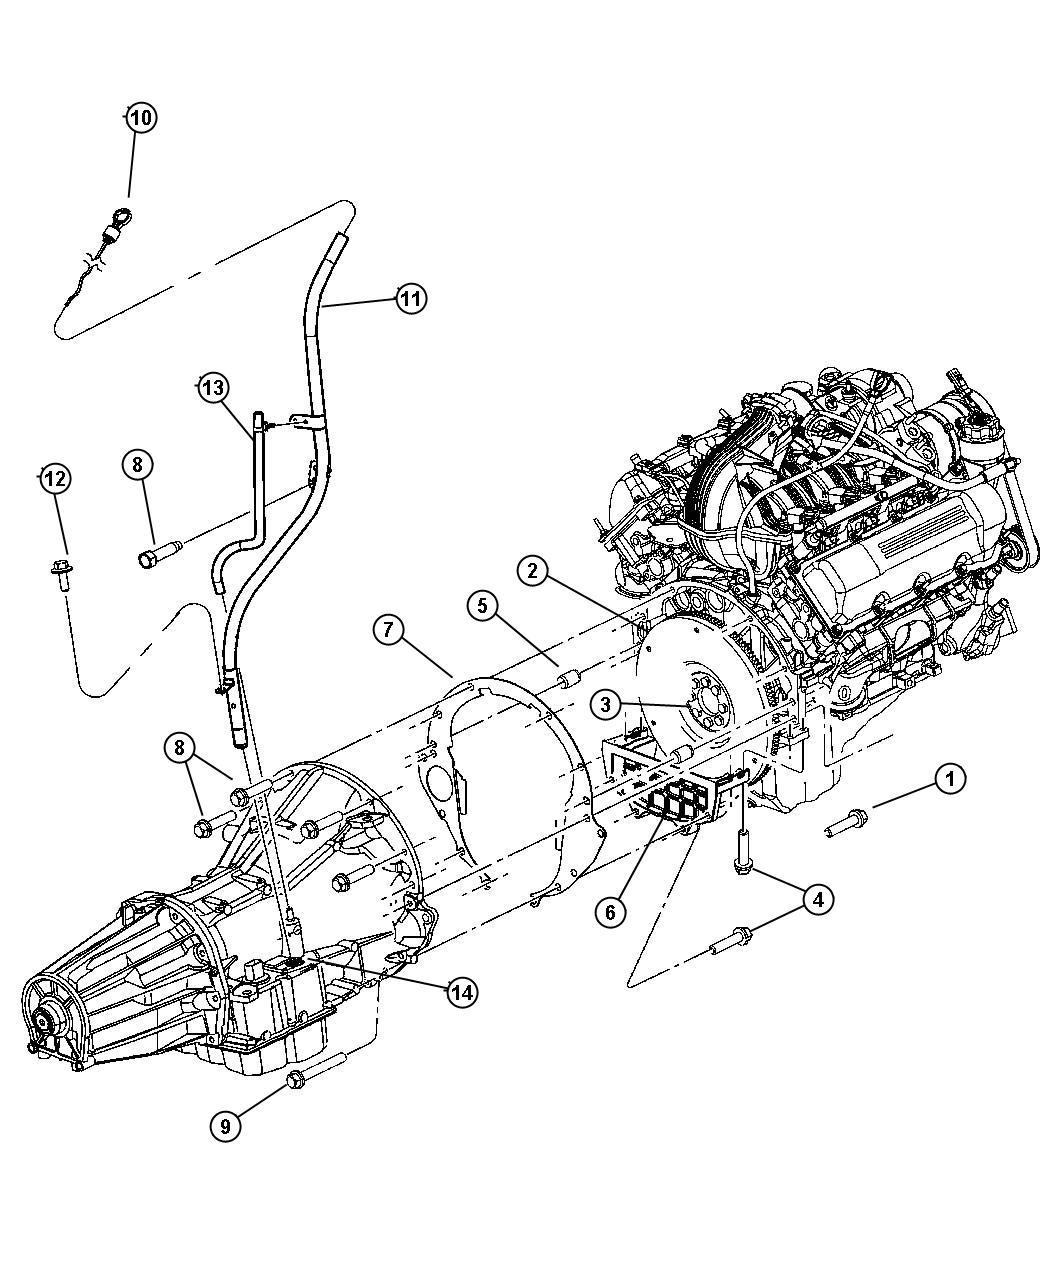 2003 range rover wiring harness